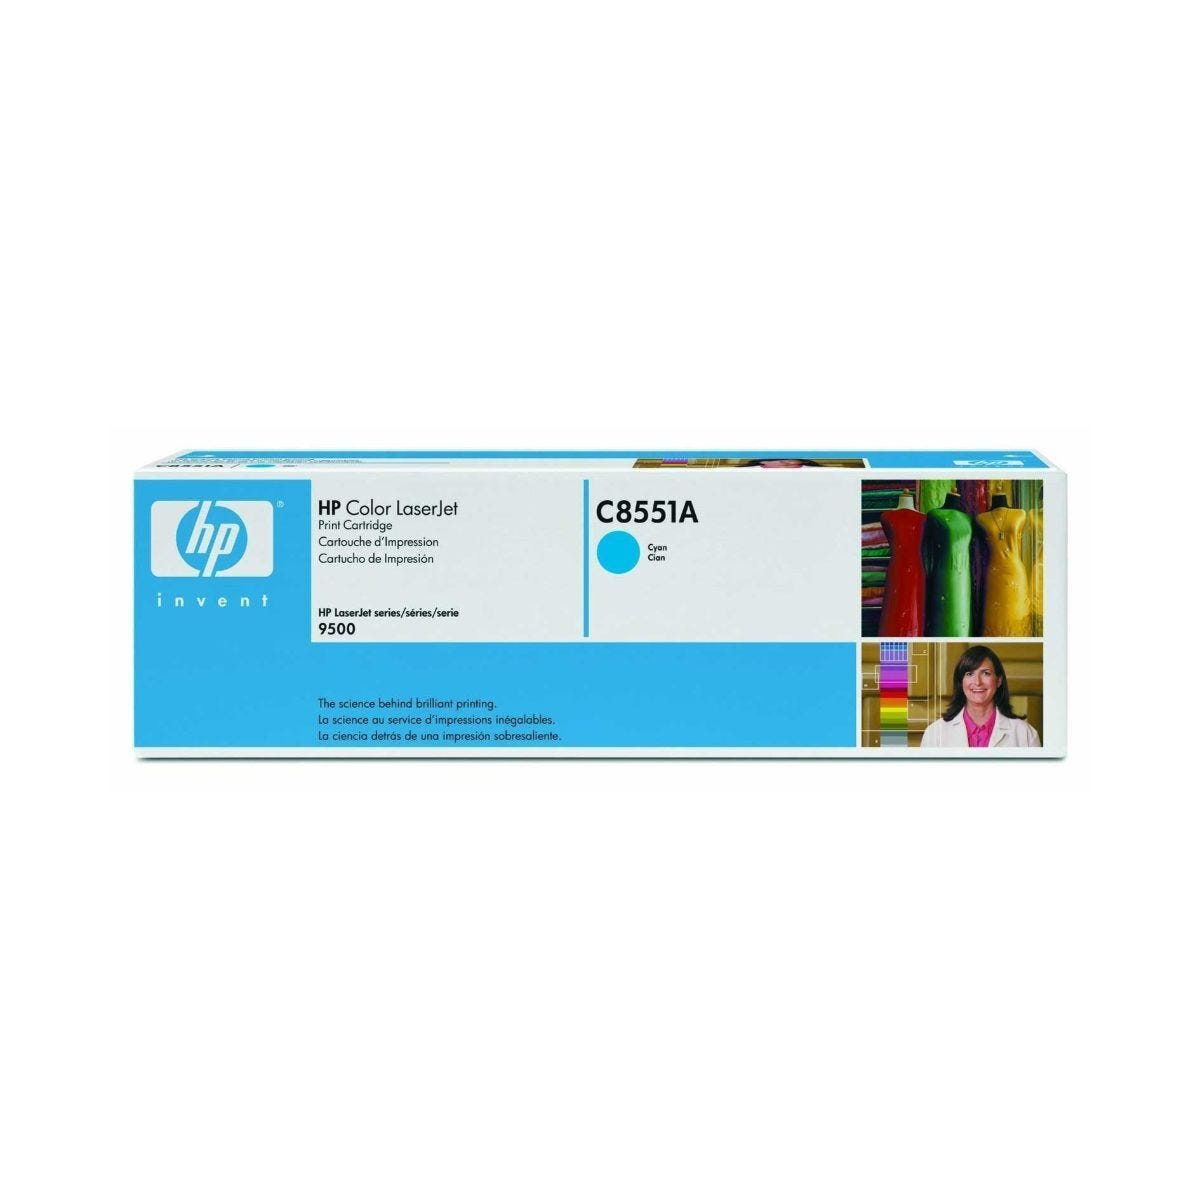 HP C8551A Laserjet Ink Toner Cartridge